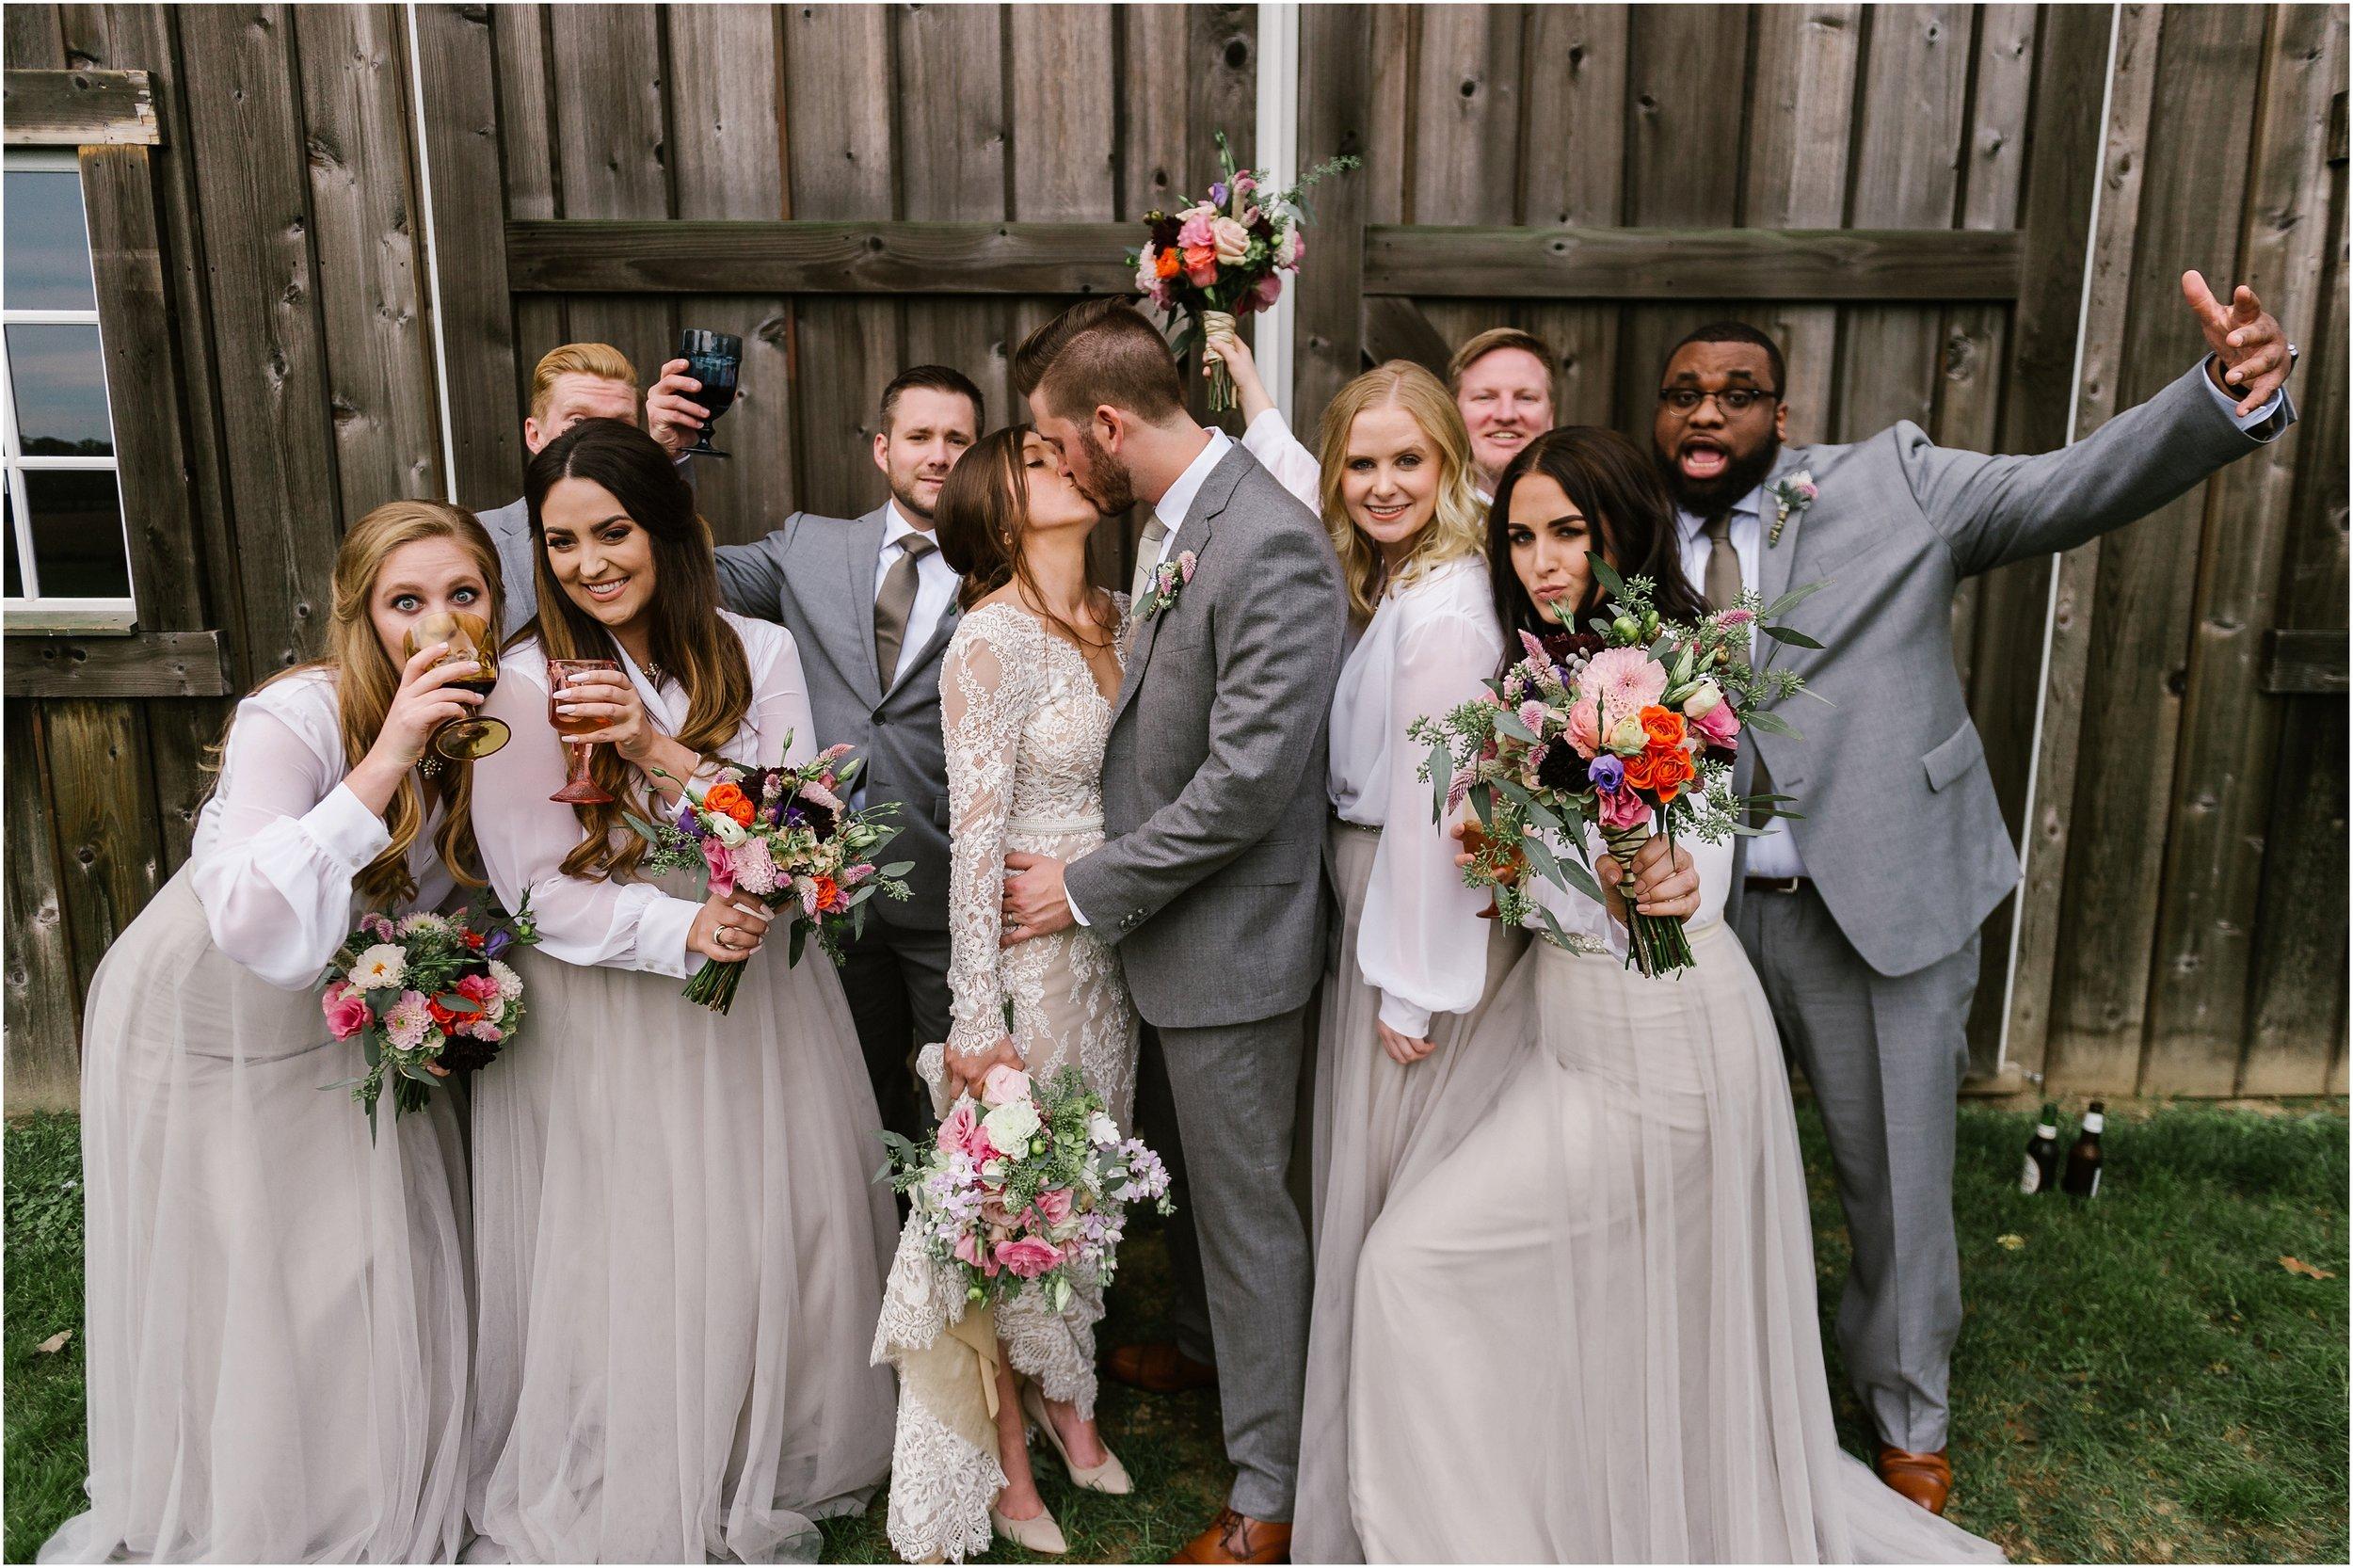 Rebecca_Shehorn_Photography_Indianapolis_Wedding_Photographer_9274.jpg